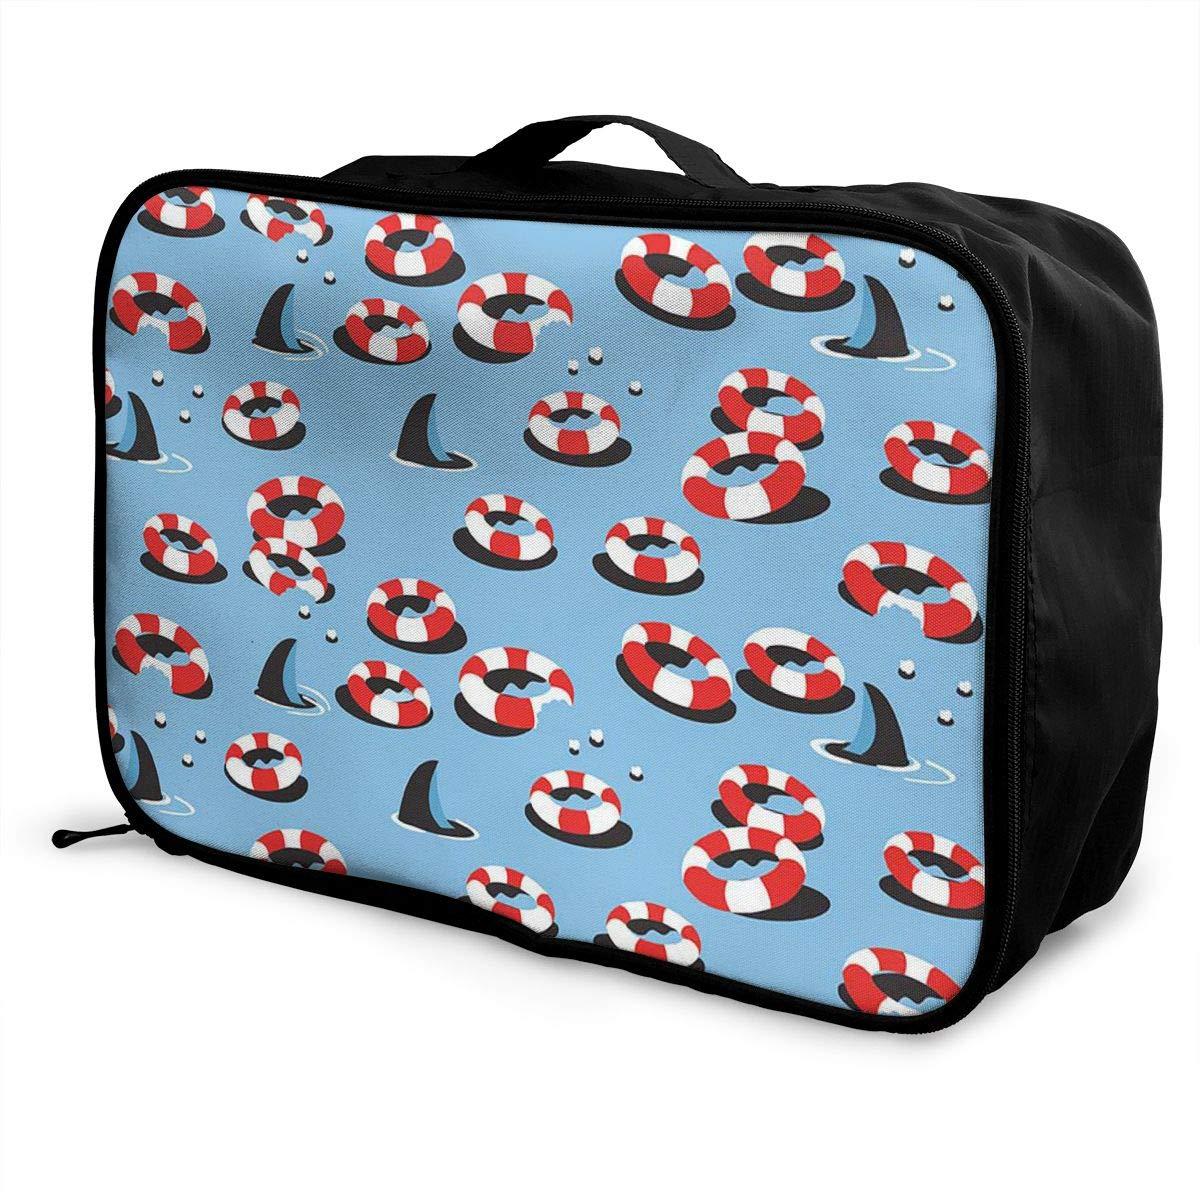 Travel Luggage Duffle Bag Lightweight Portable Handbag Shark Pattern Large Capacity Waterproof Foldable Storage Tote